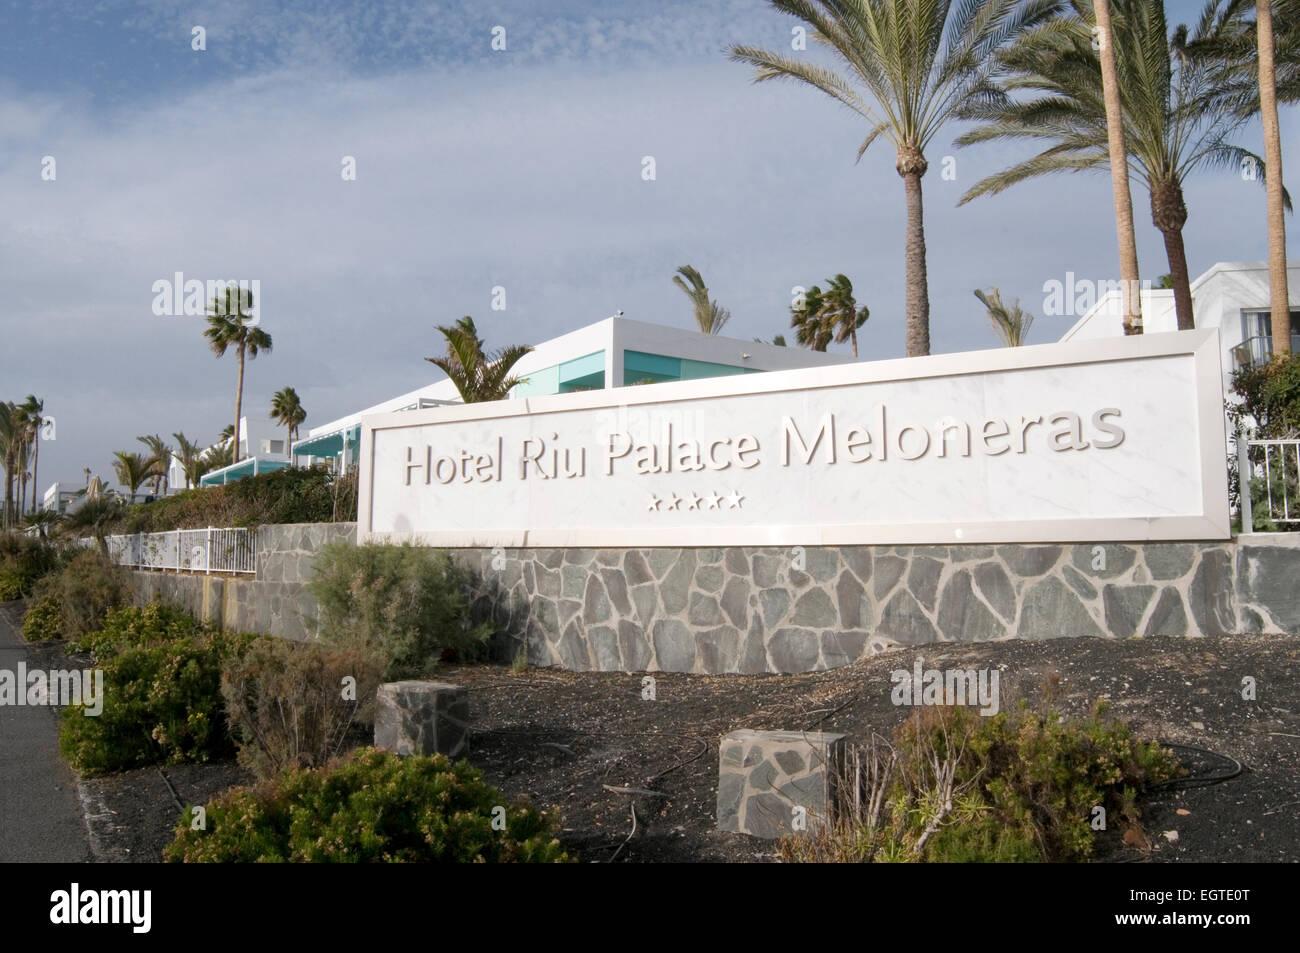 hotel riu palace meloneras gran canaria canary islands isles spainish hotel chain spain - Stock Image